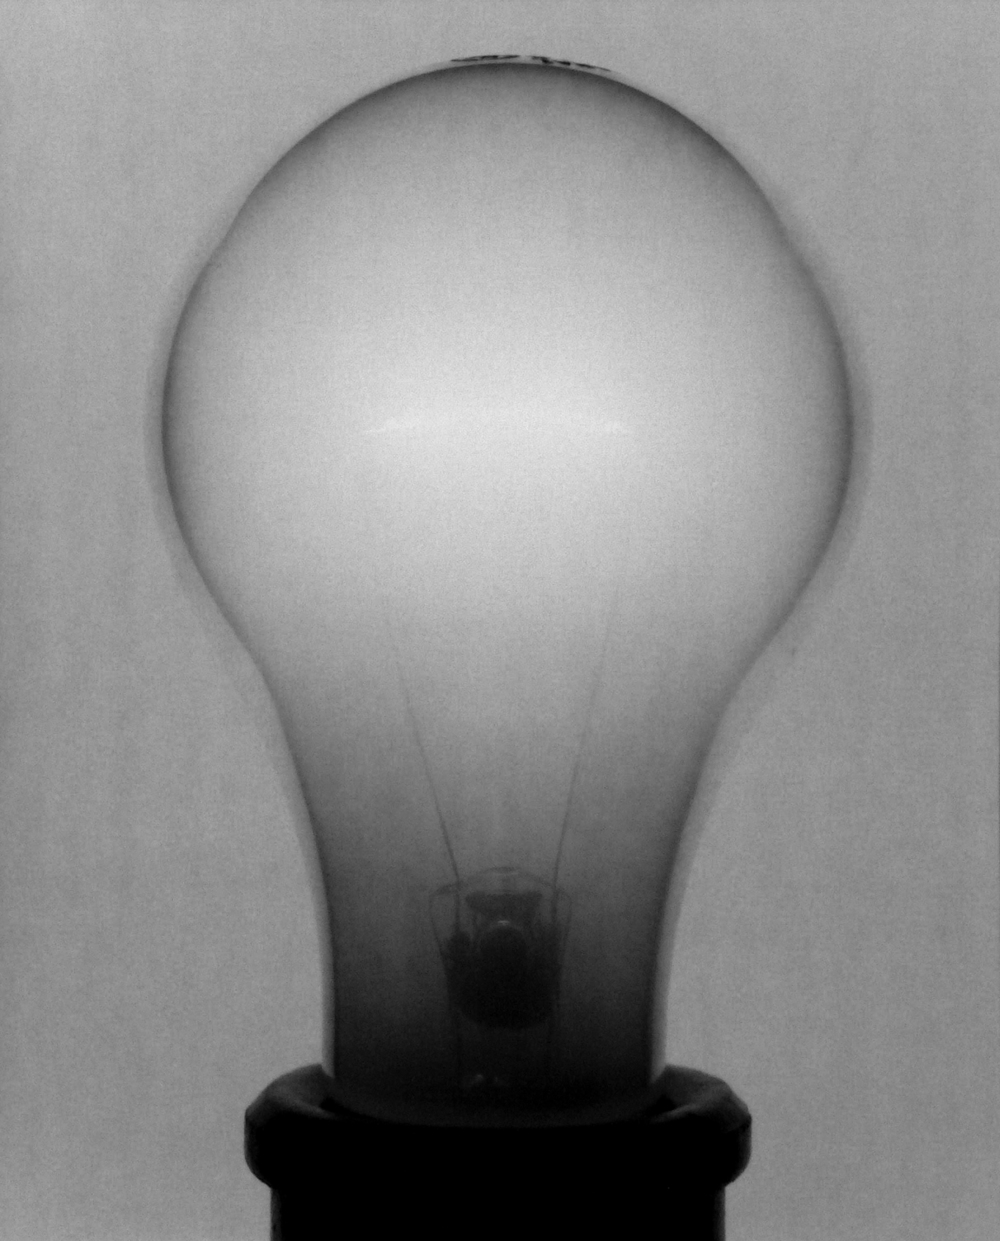 Light Bulb 5 (CP 2), 2006